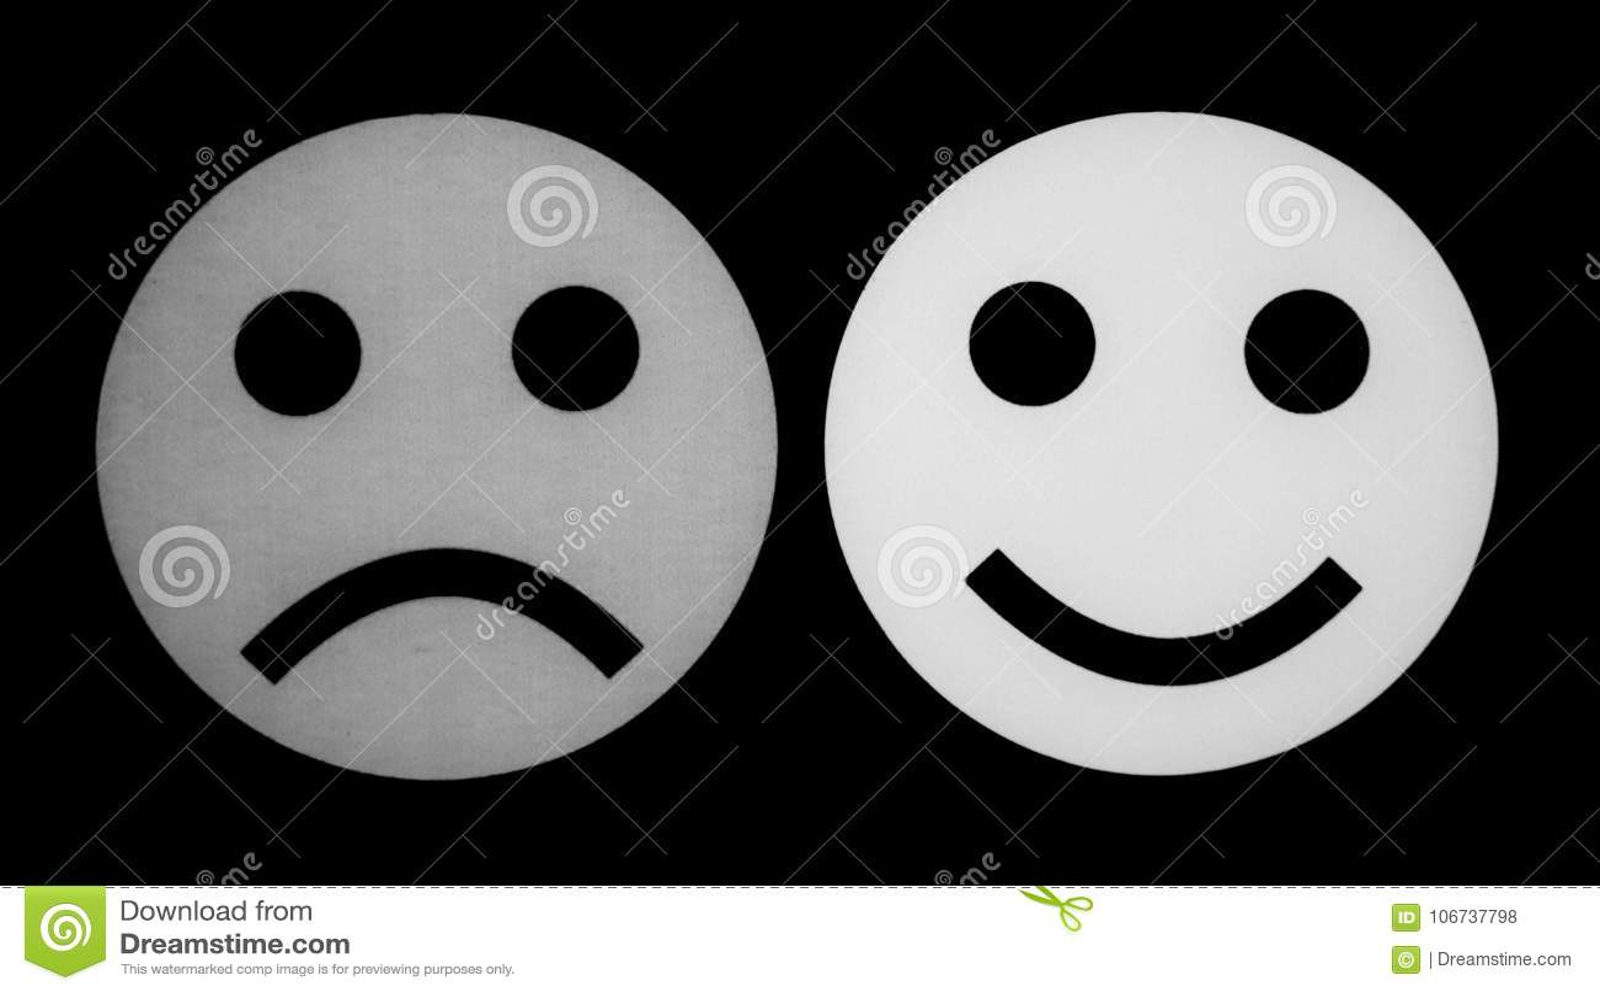 Sad face emoji black and white